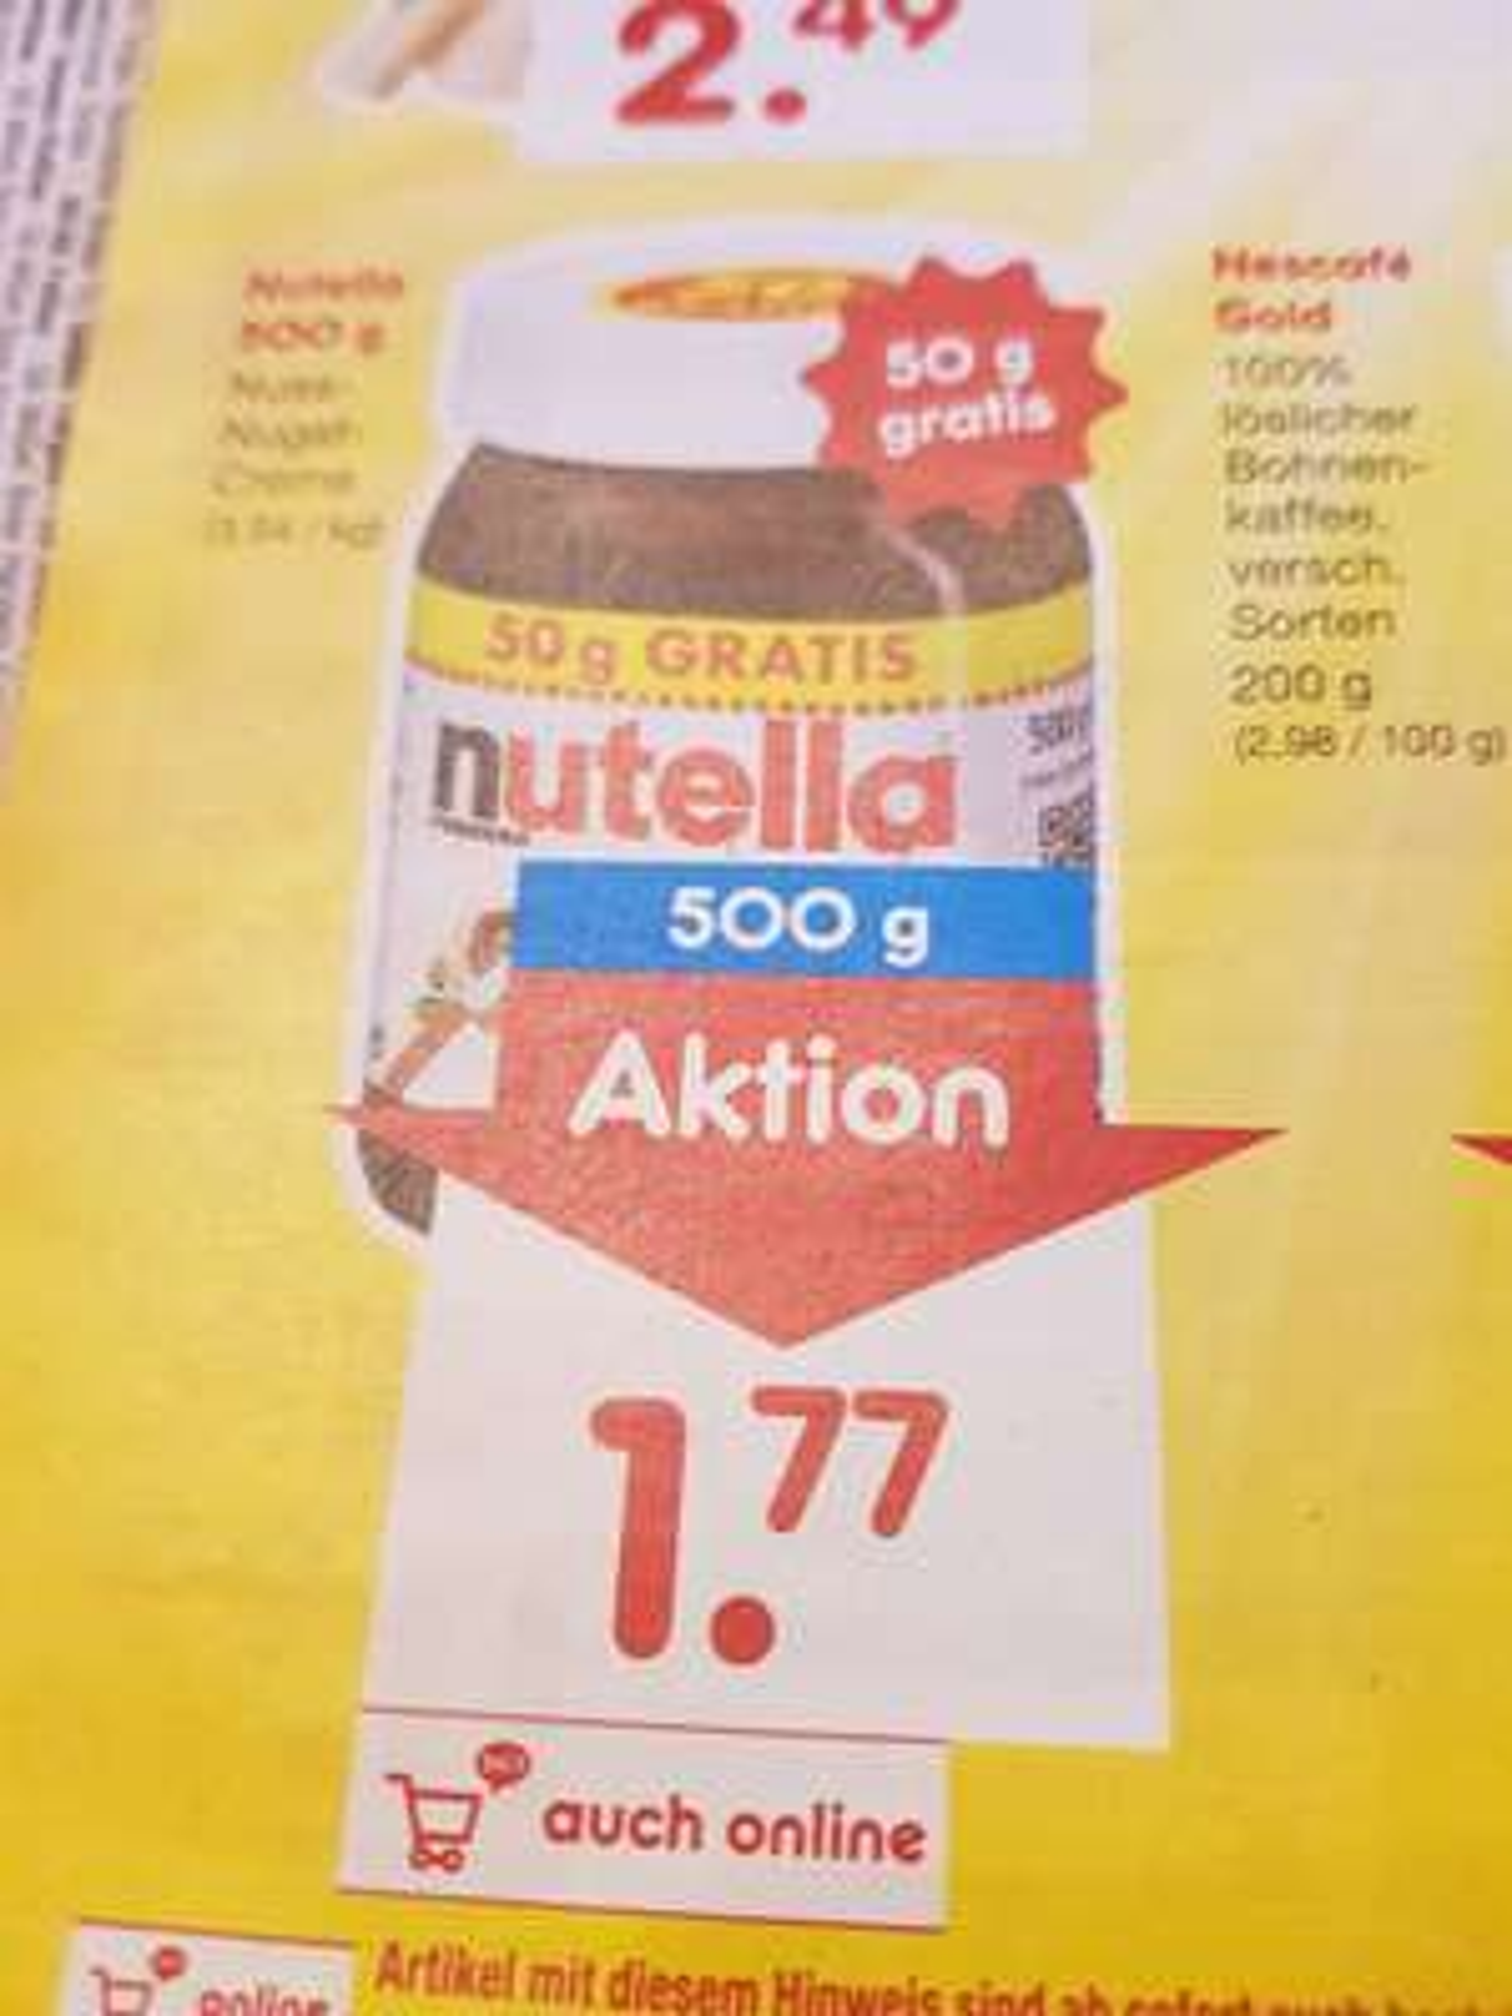 Nutella [Netto Marken Discount] 31.03.18